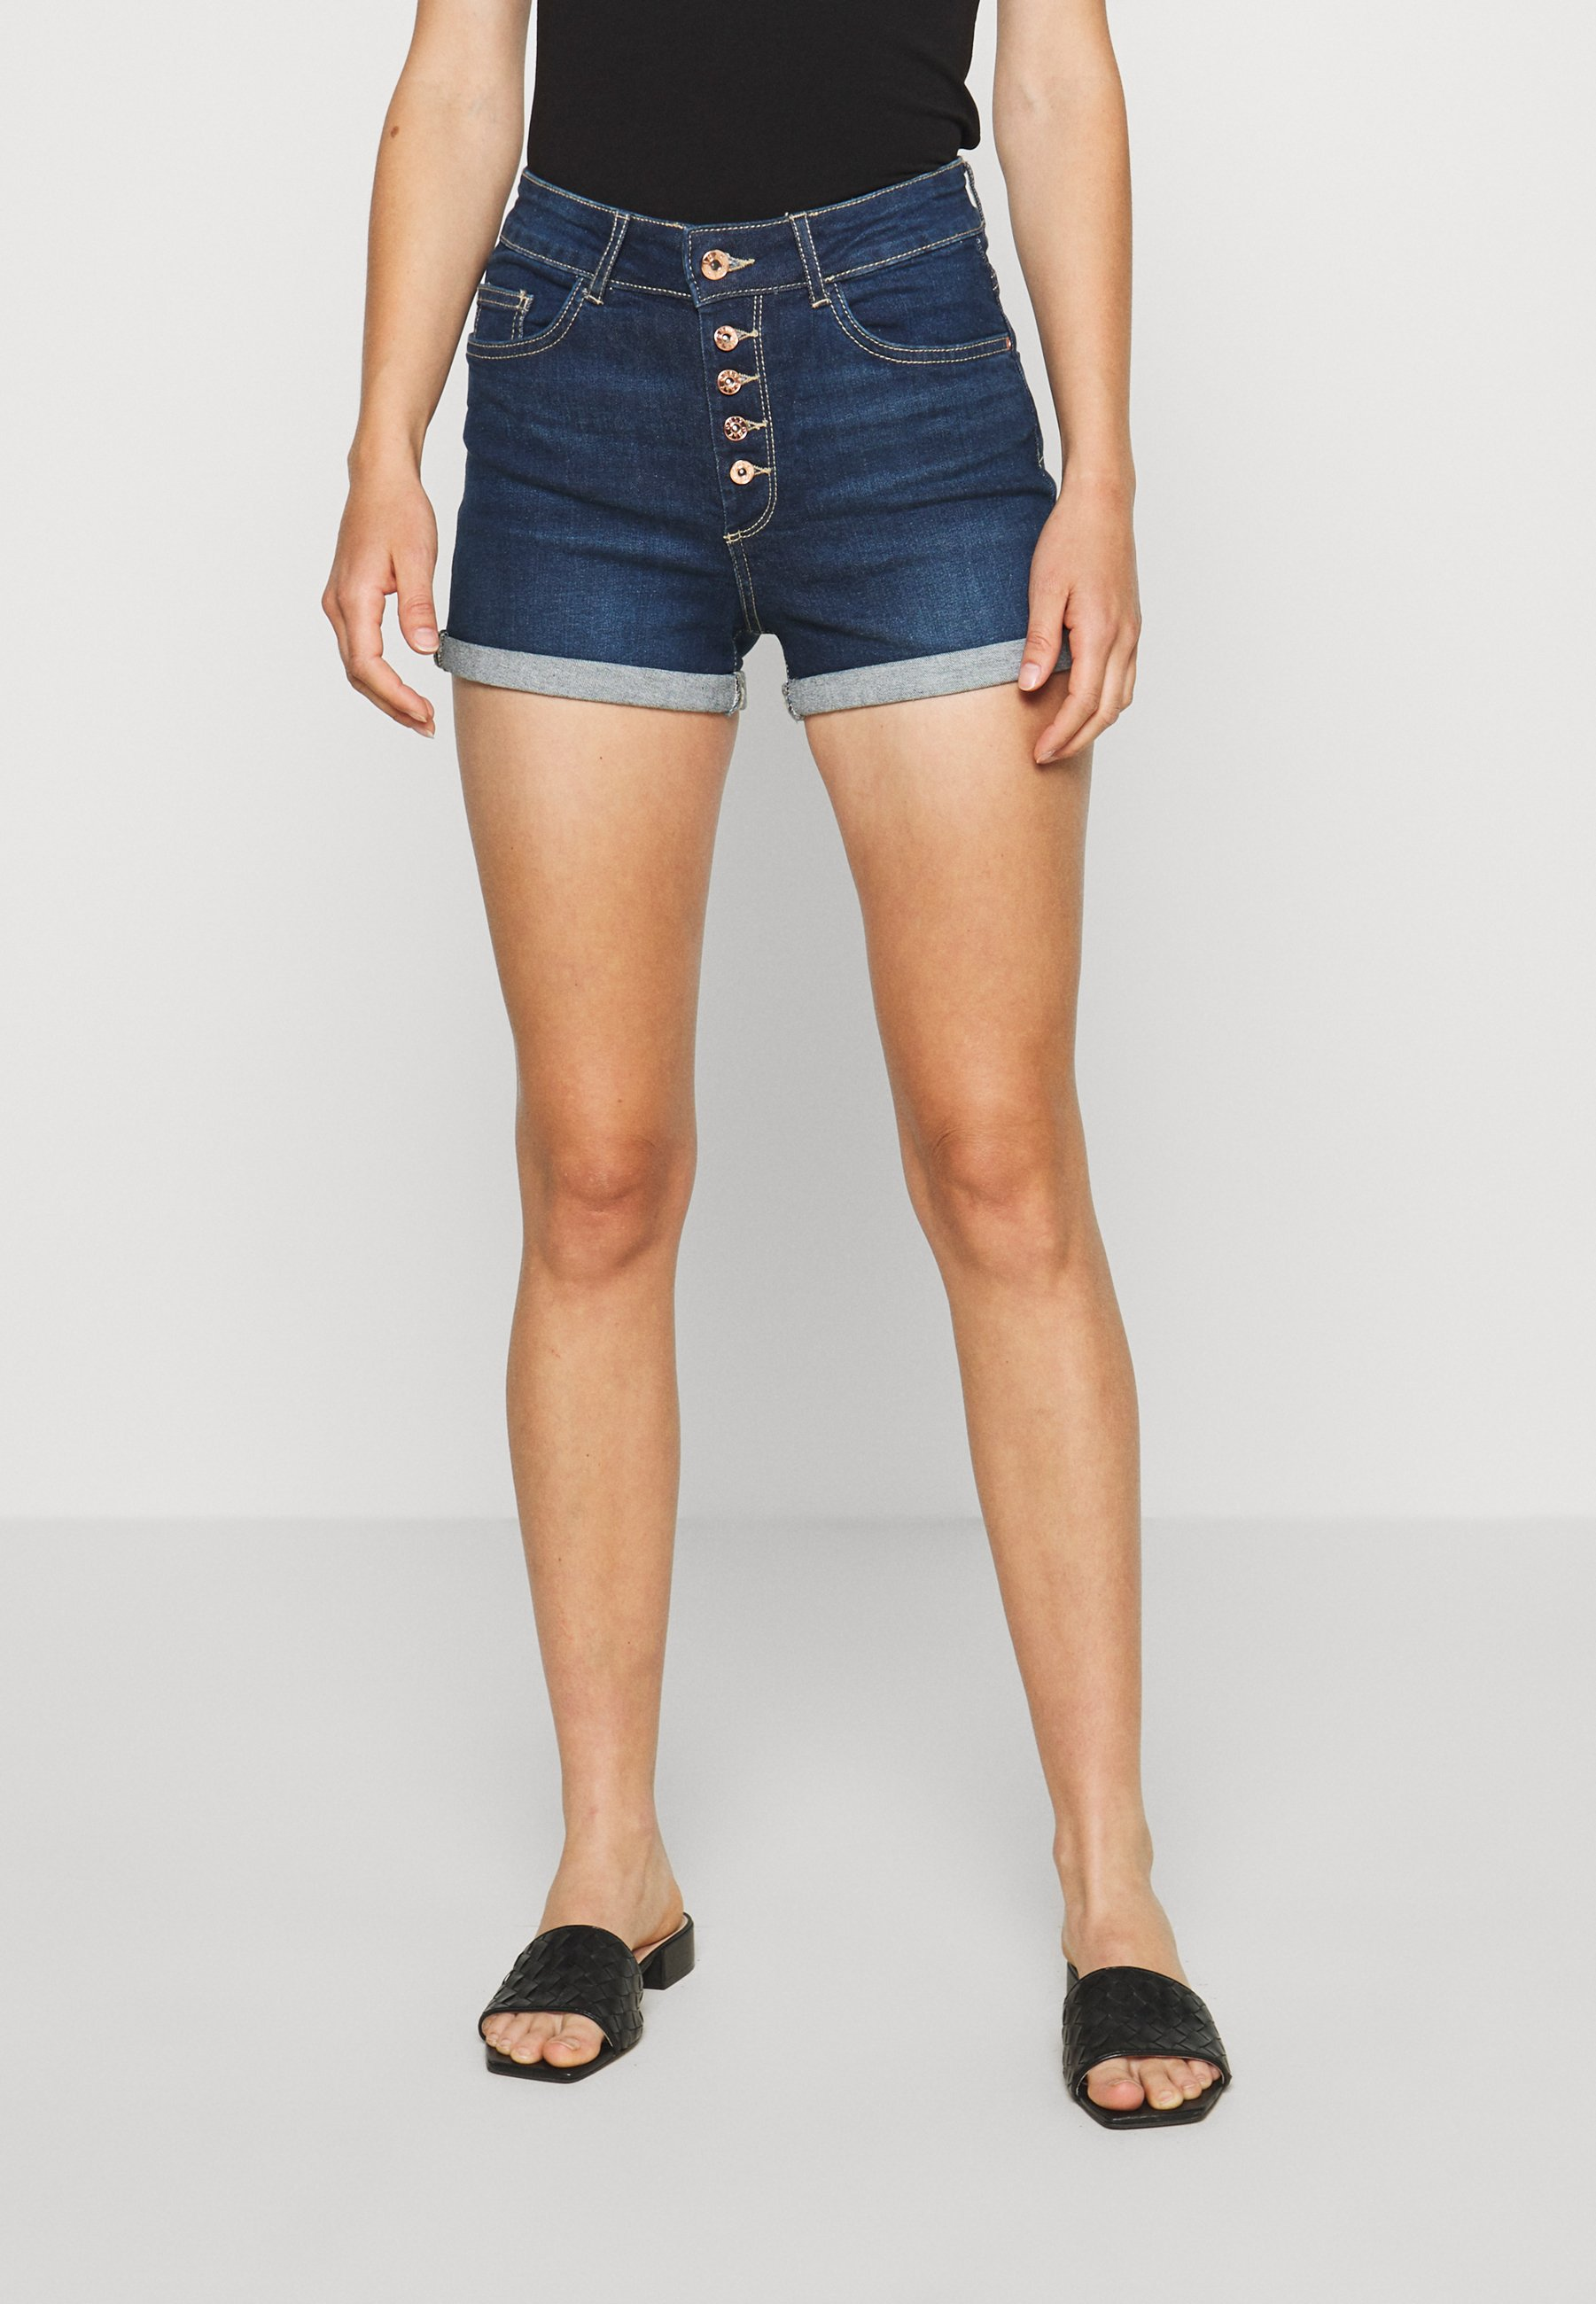 Femme ONLHUSH BUTTON BOX - Short en jean